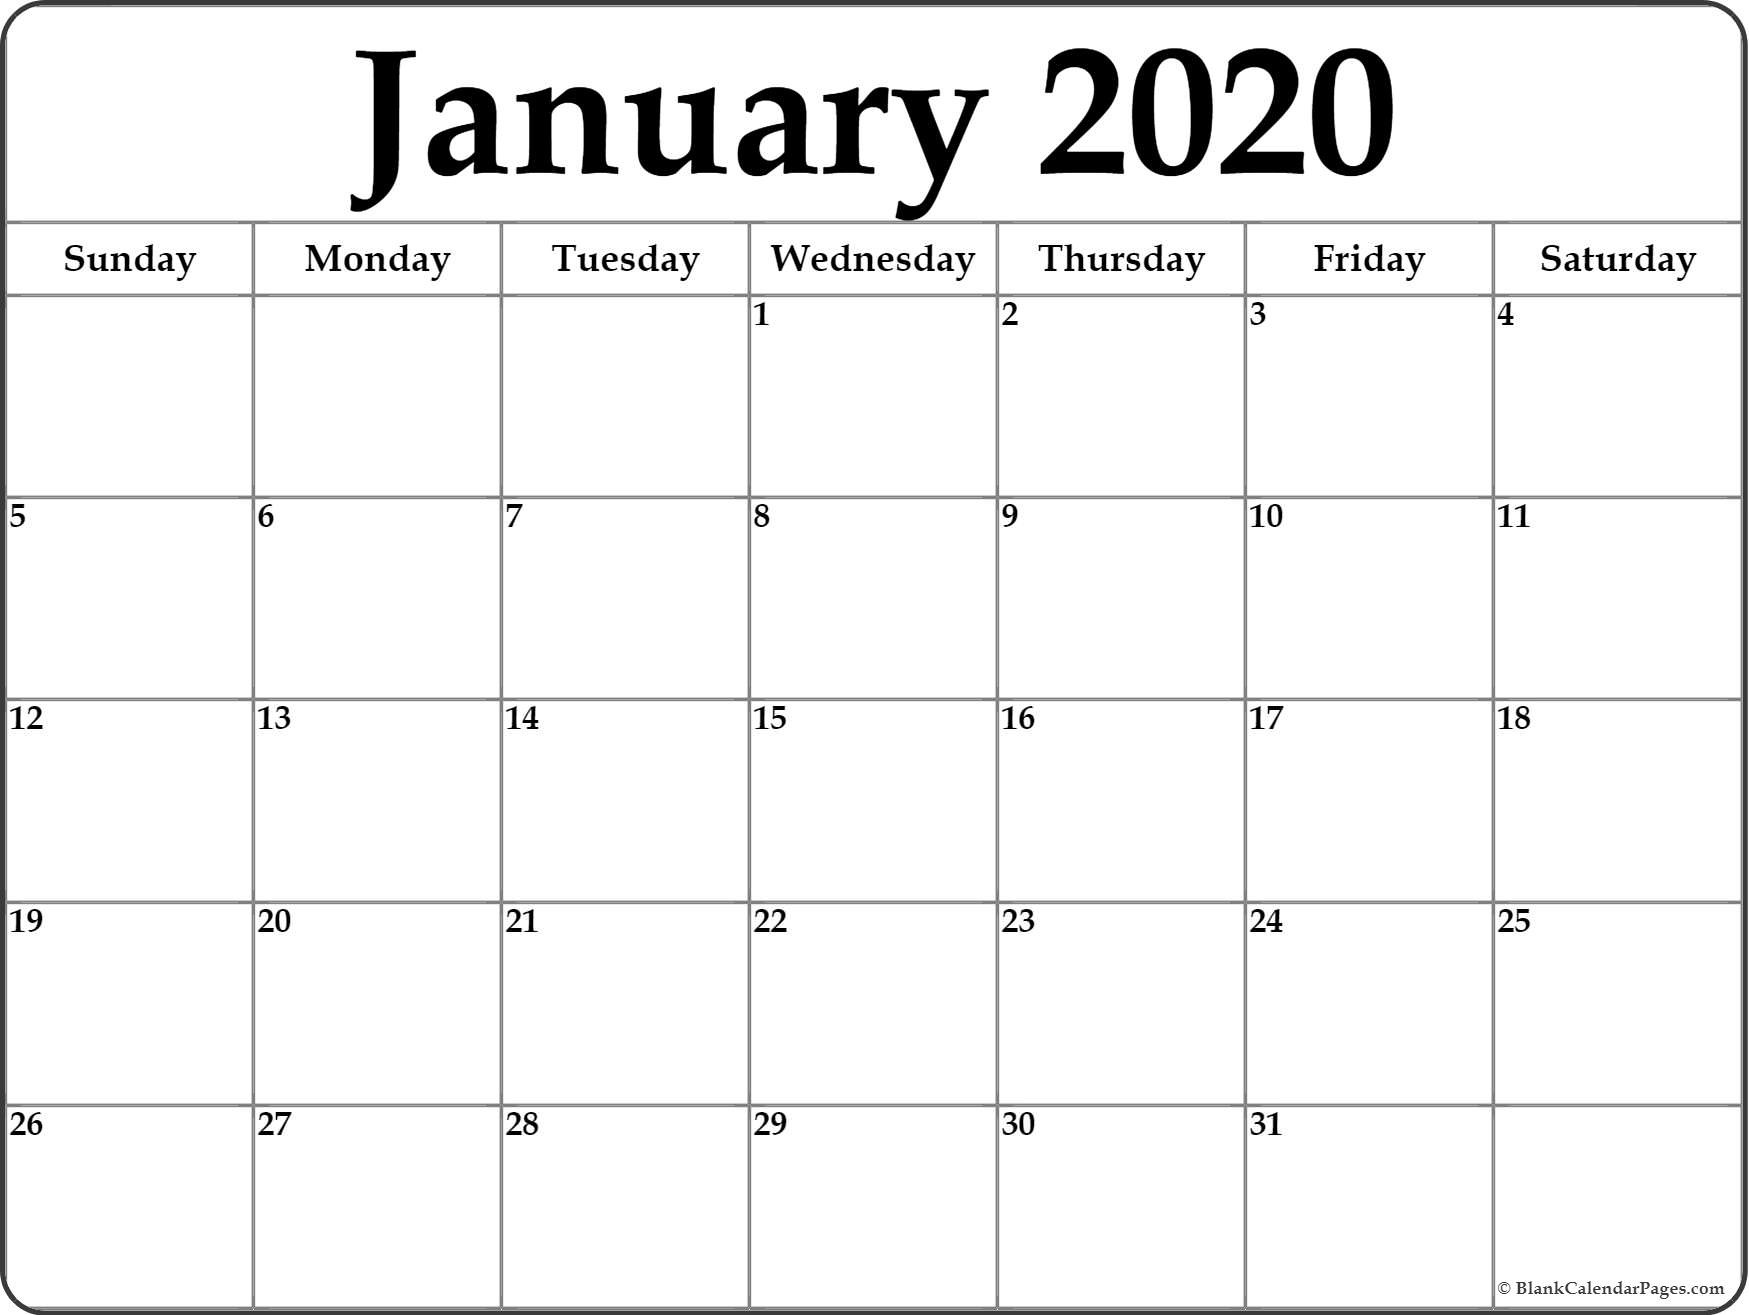 Monthly 2020 Calendar Printable January 2020 Blank Calendar Collection